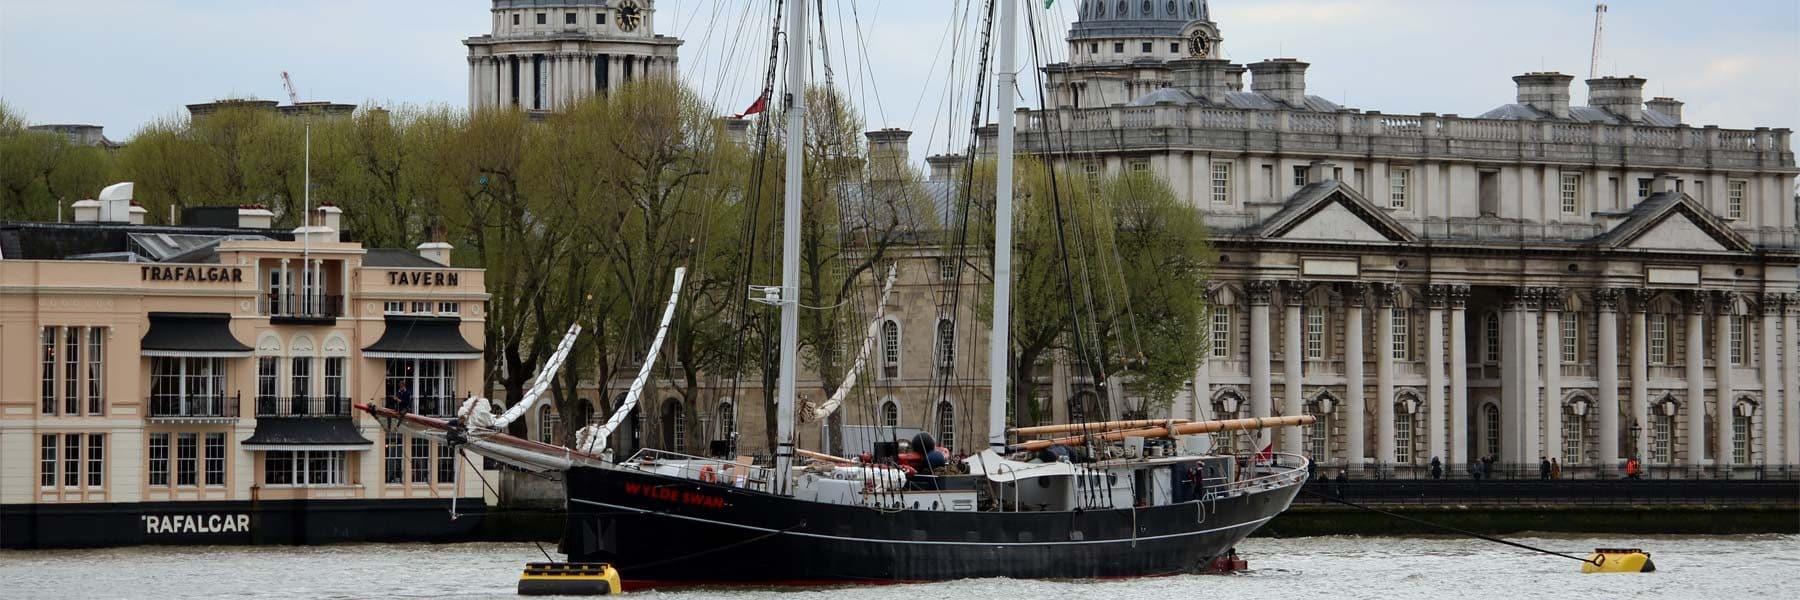 header-tall-ship-wylde-swan-01